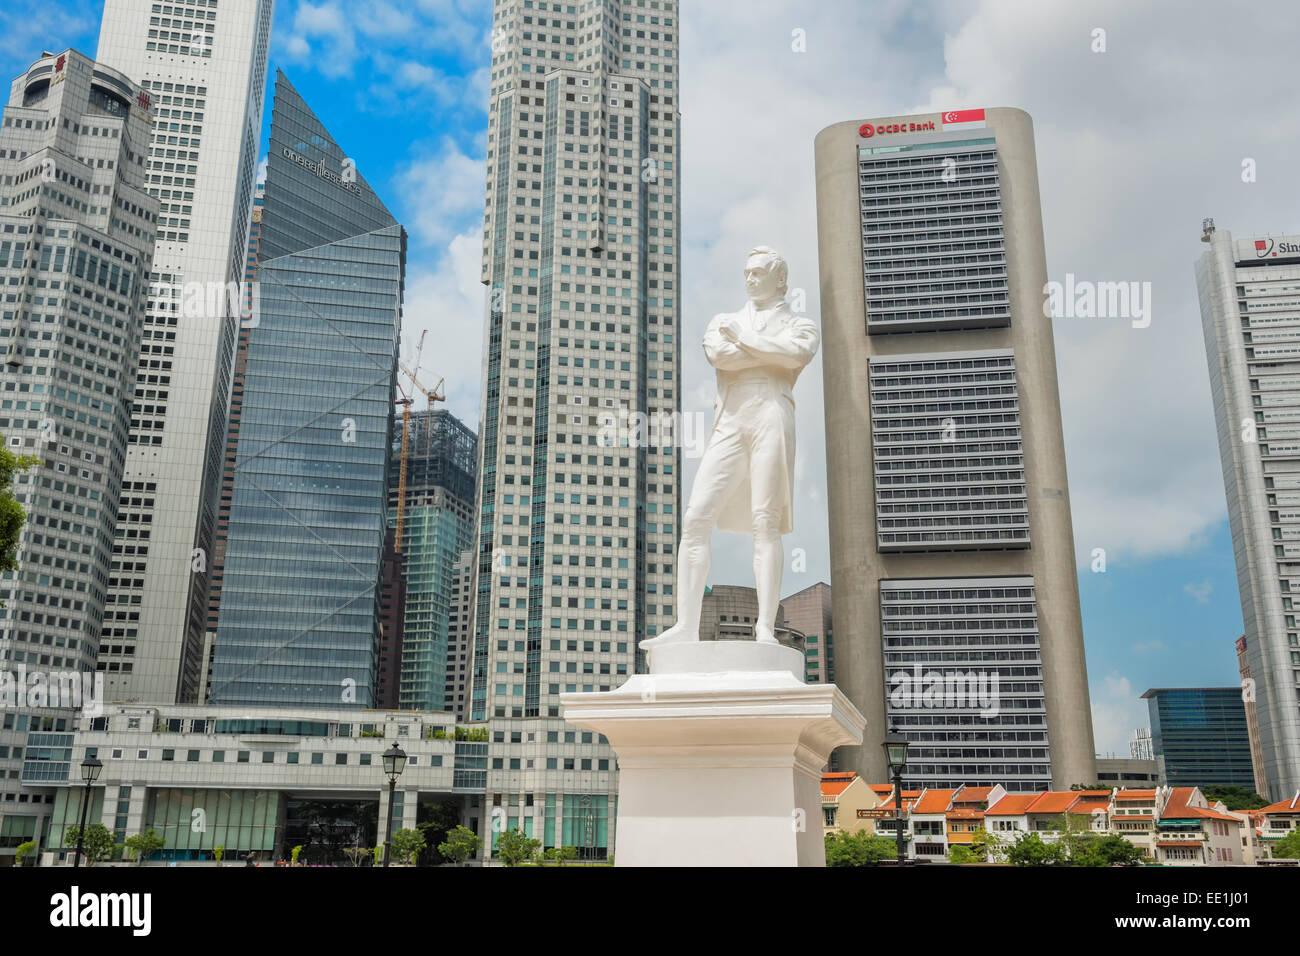 Raffles landing site, Sir Thomas Stamford Raffles statue, Singapore, Southeast Asia, Asia - Stock Image